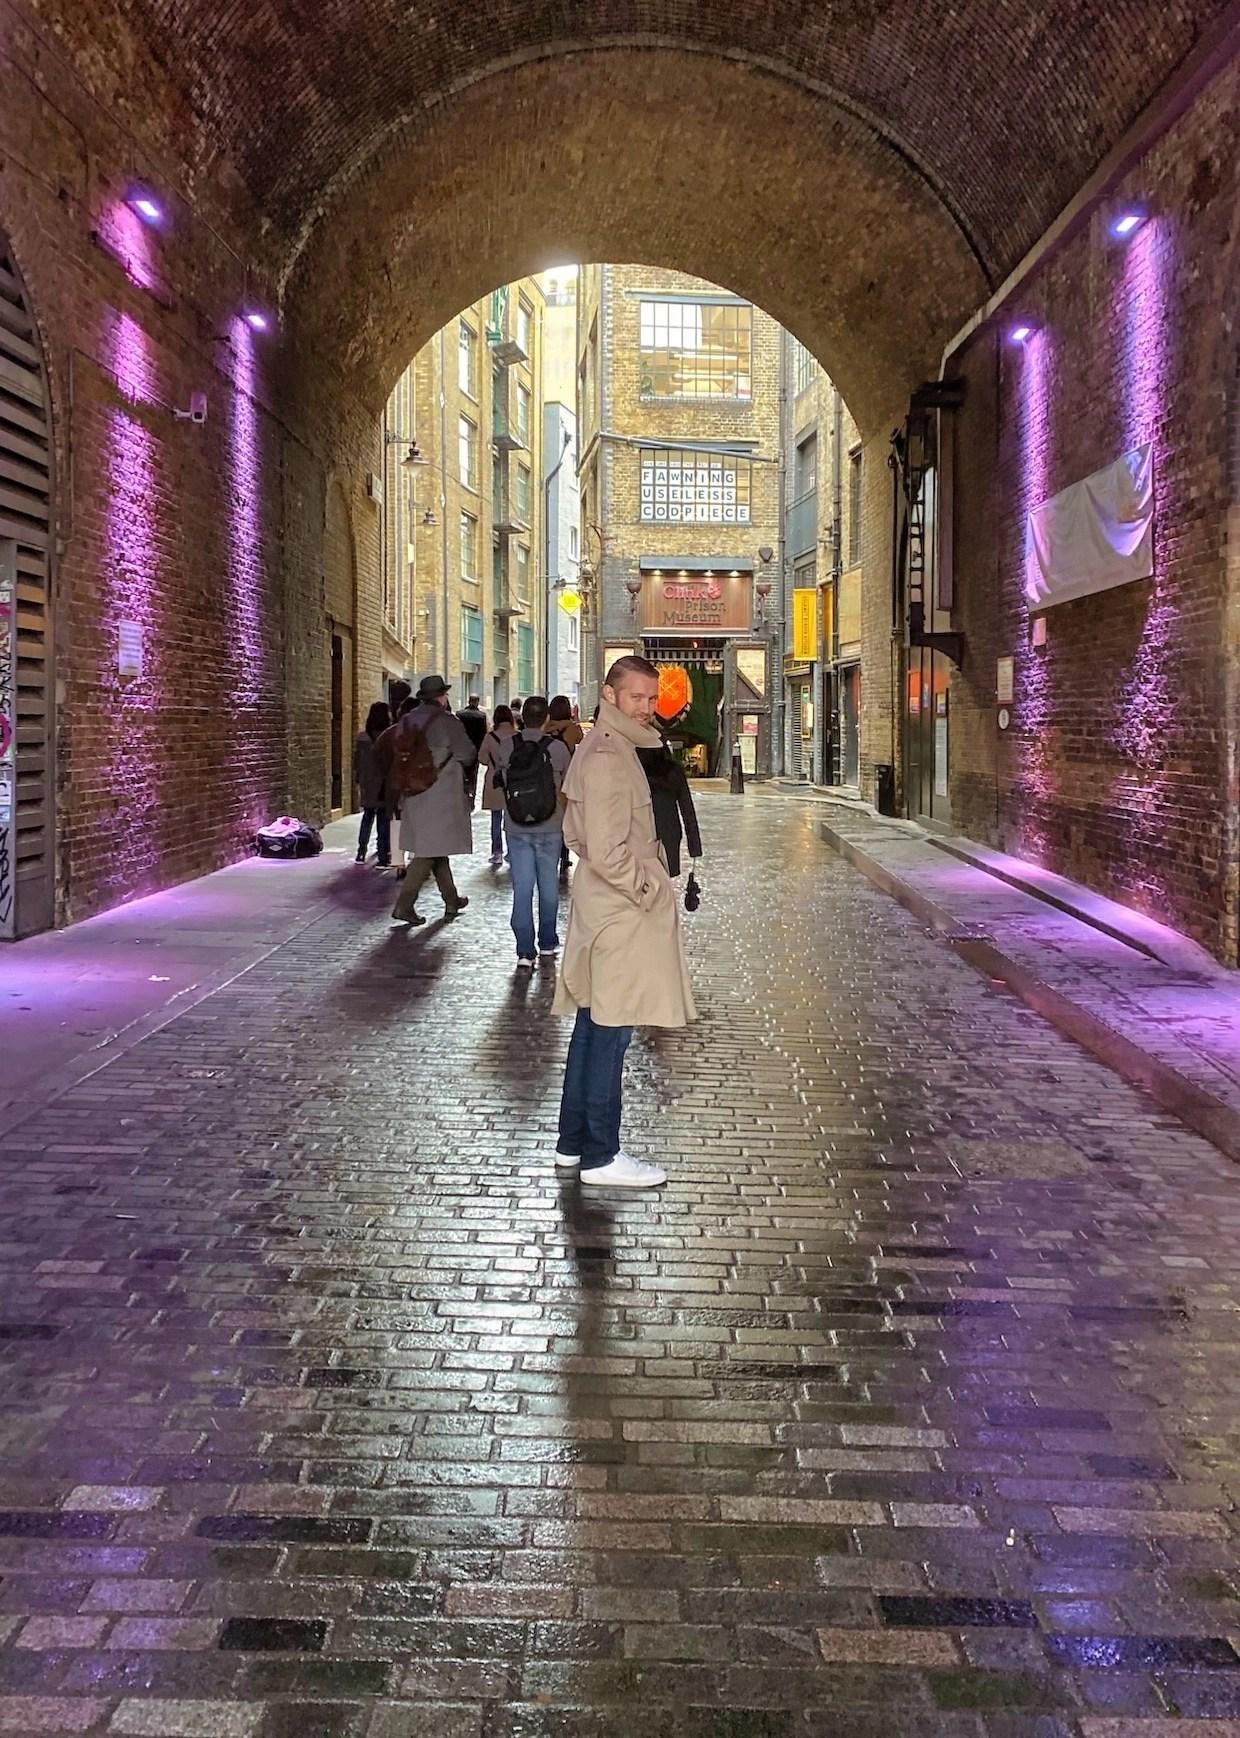 Harry Potter London - Knockturn Alley